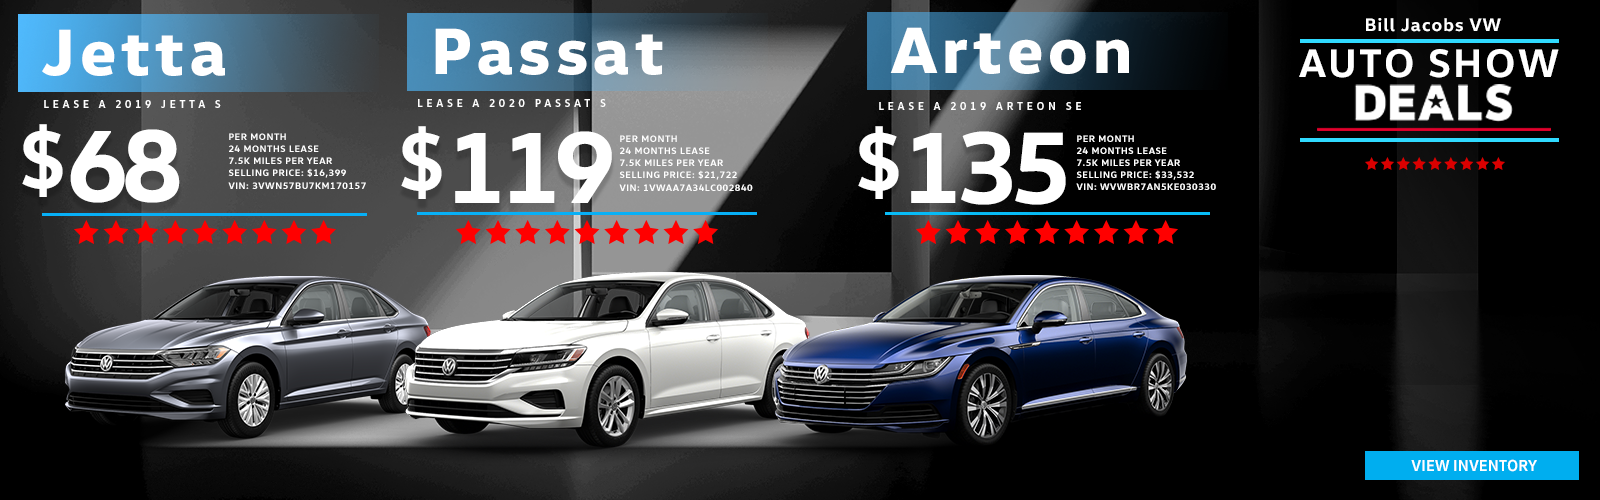 Auto Show Lease Specials of Volkswagen Jetta, Arteon, and Passat